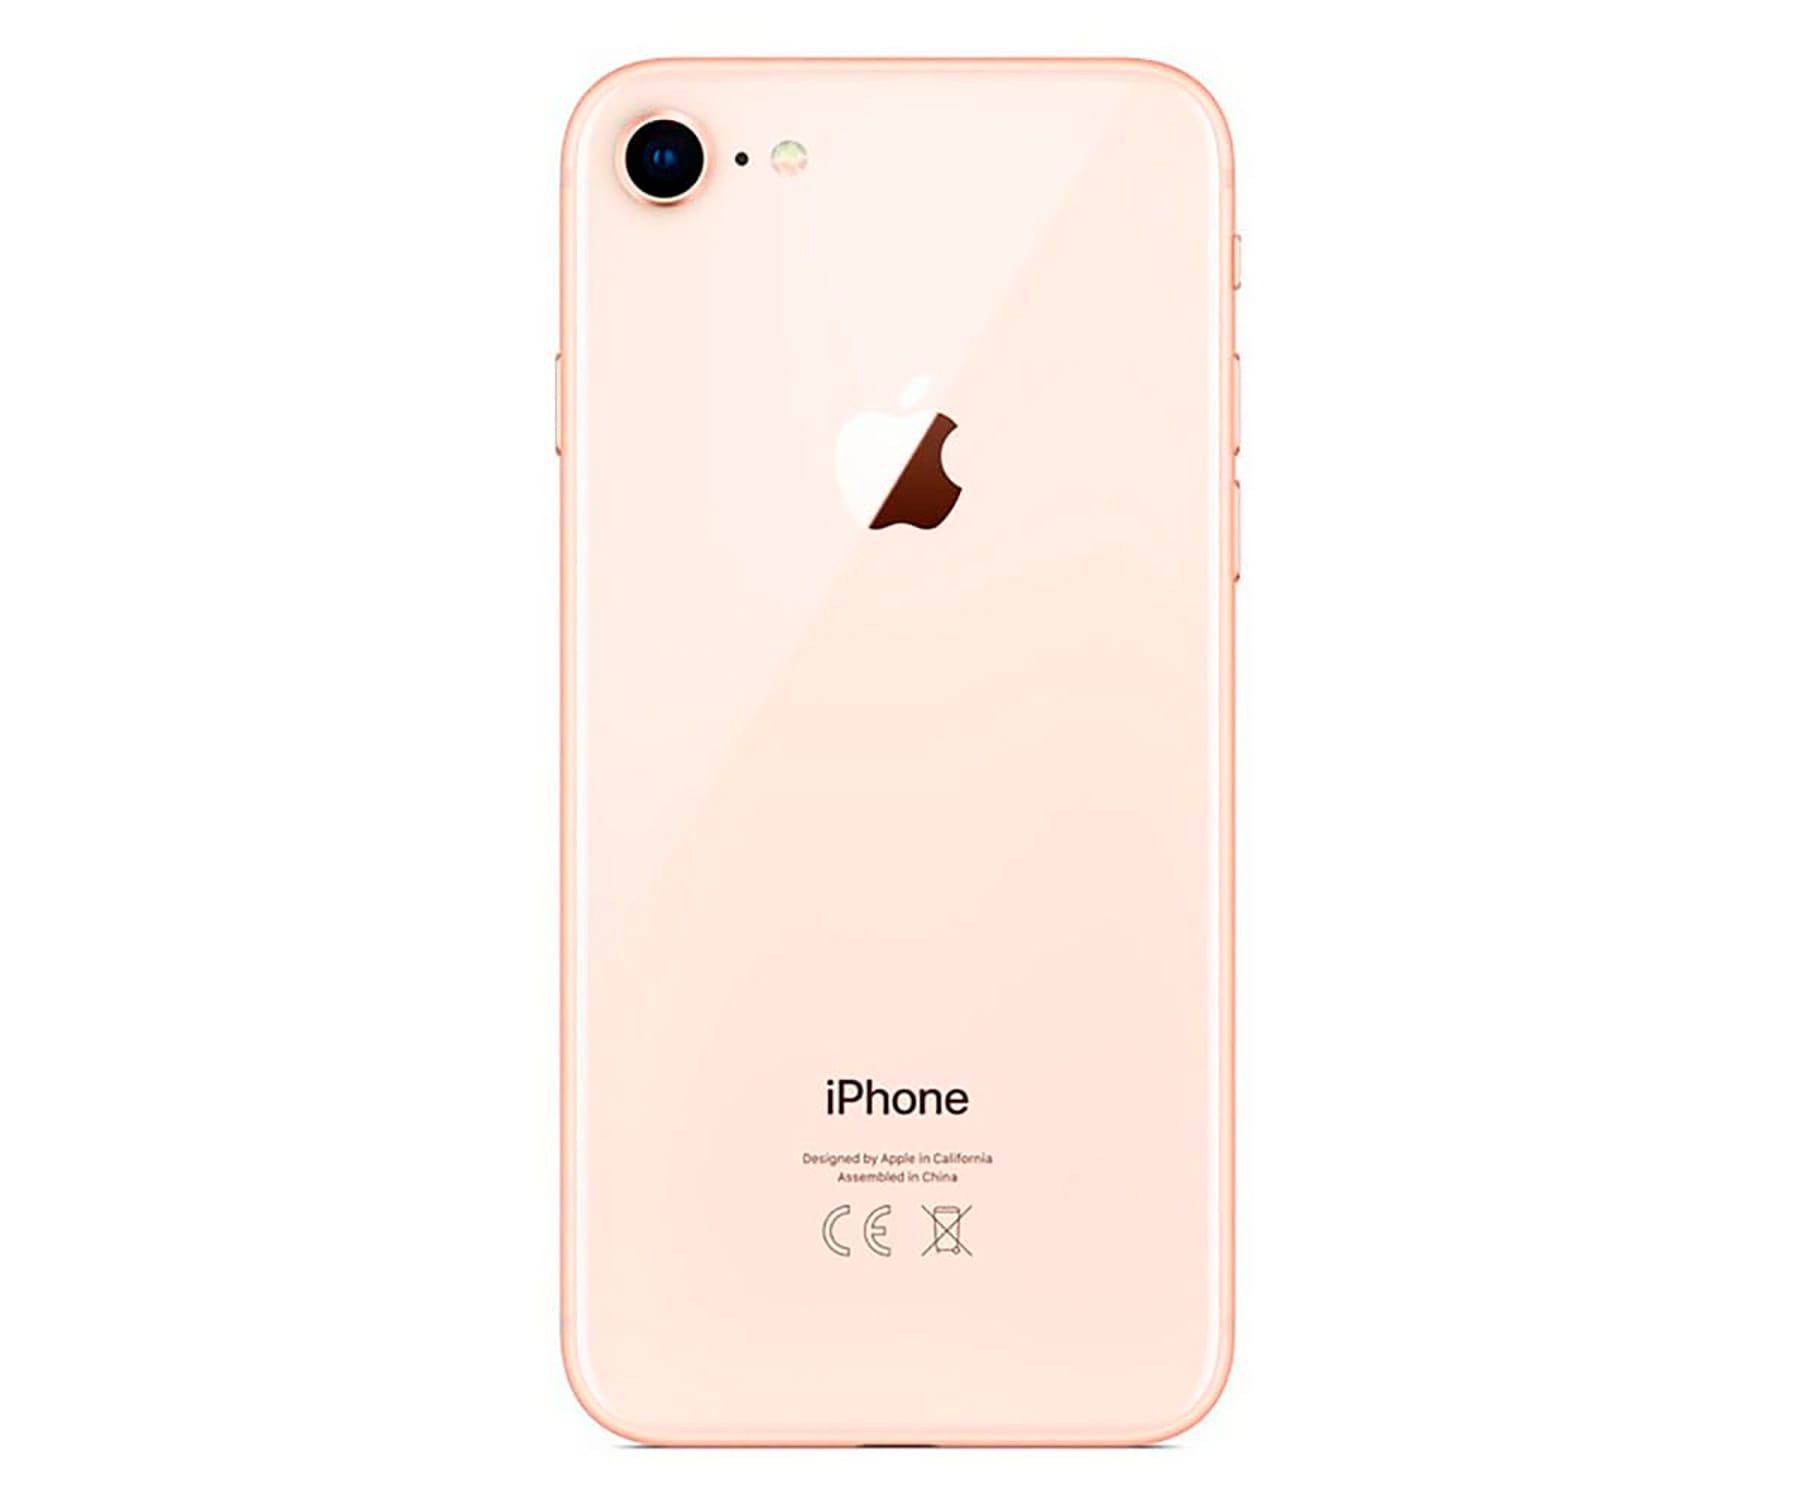 Apple Iphone 8 64gb Oro Reacondicionado Cpo Móvil 4g 4.7'' Retina Hd/6core/64gb/... (3)